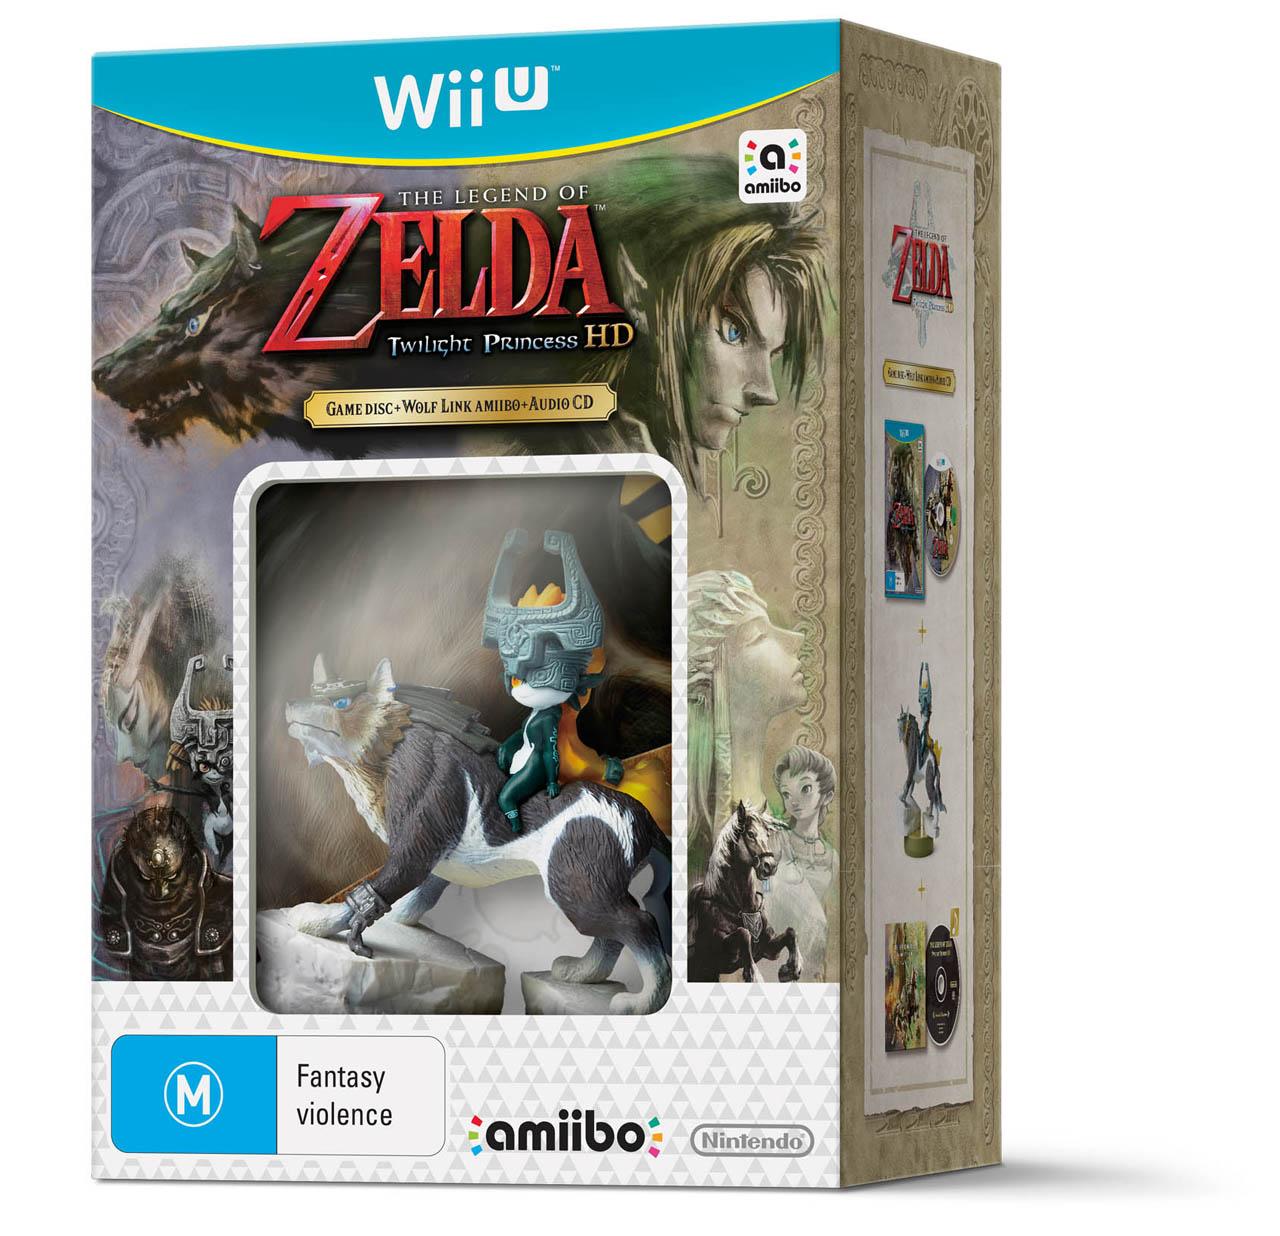 The Legend of Zelda Twilight Princess HD Bundle